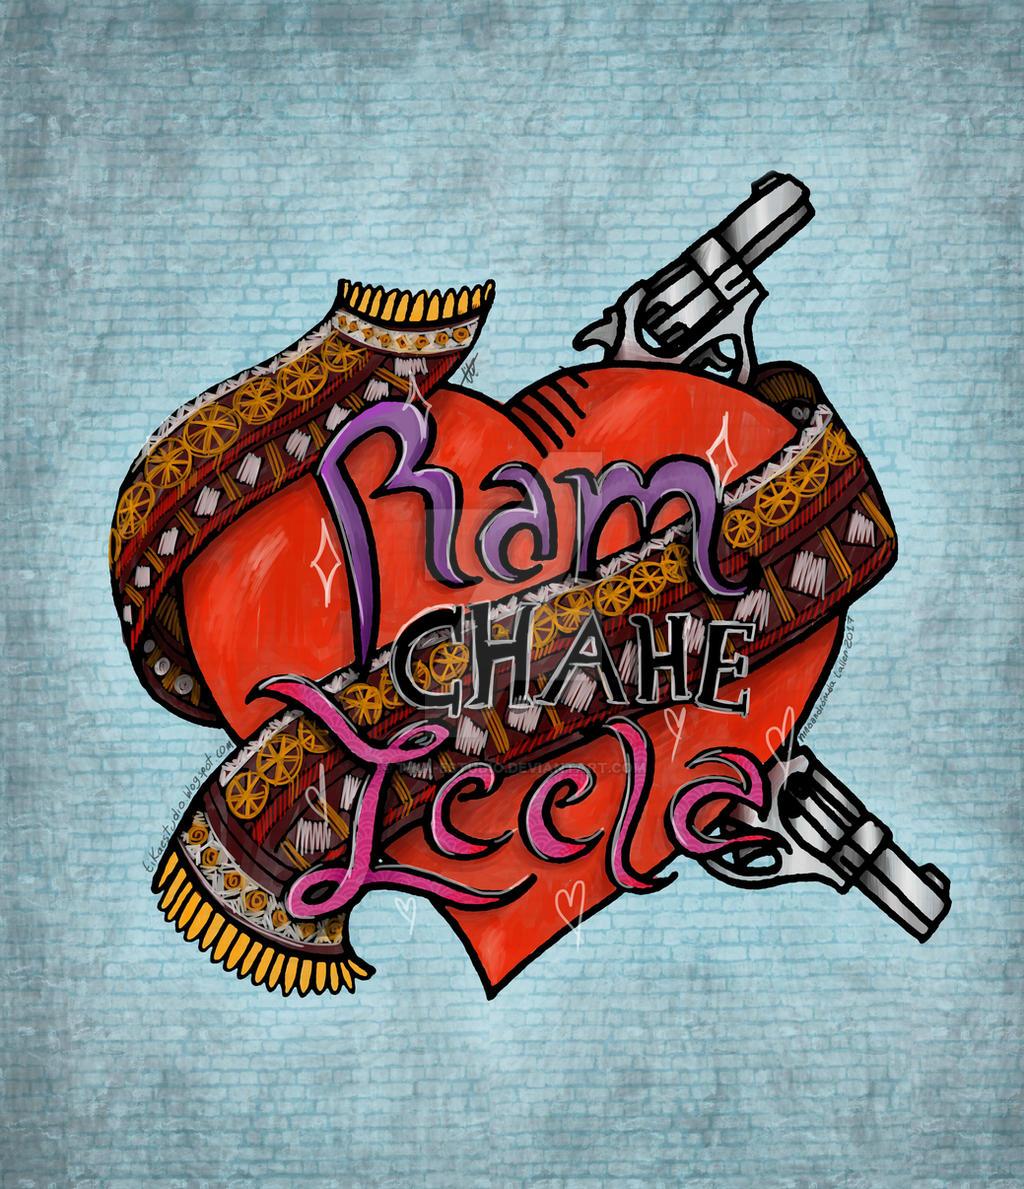 Ram Chahe Leela by Tika-estudio